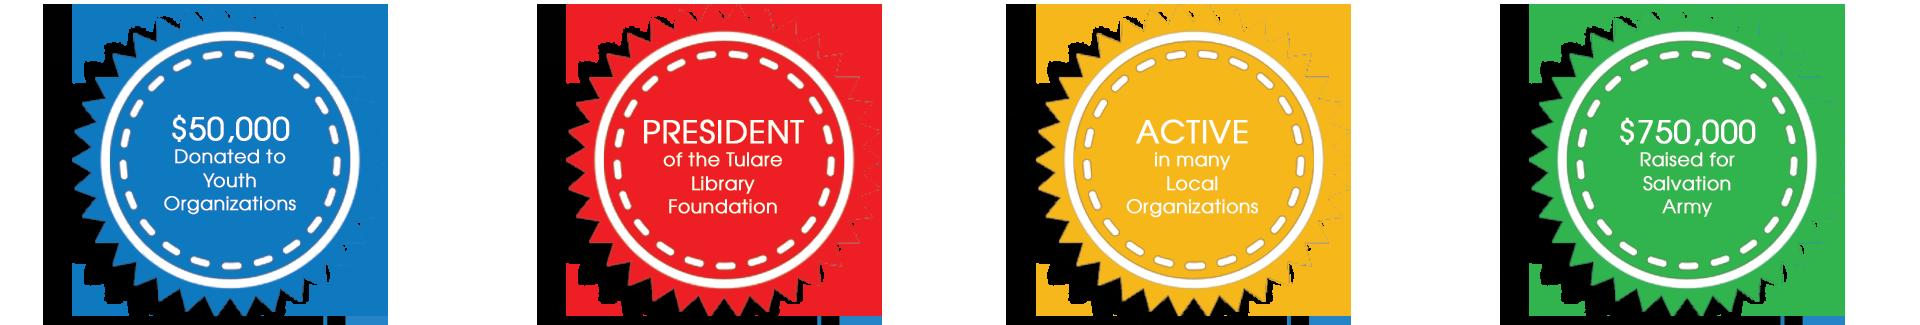 Banner-CommunityInvolvement